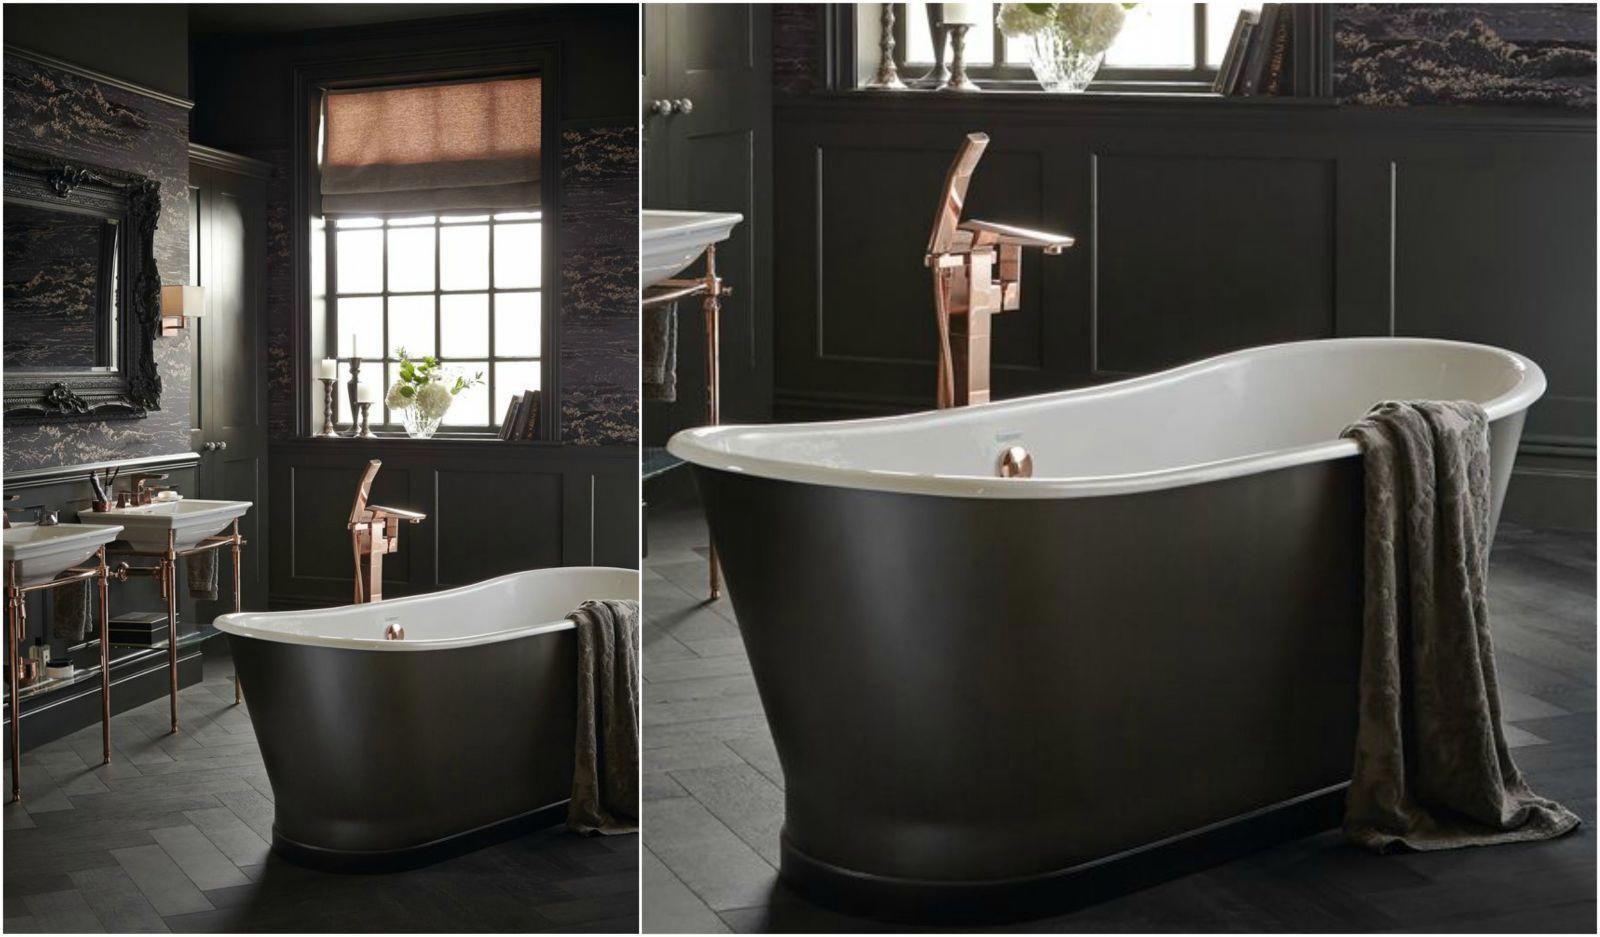 7 top tips for creating a luxury bathroom retreat rh pinterest com